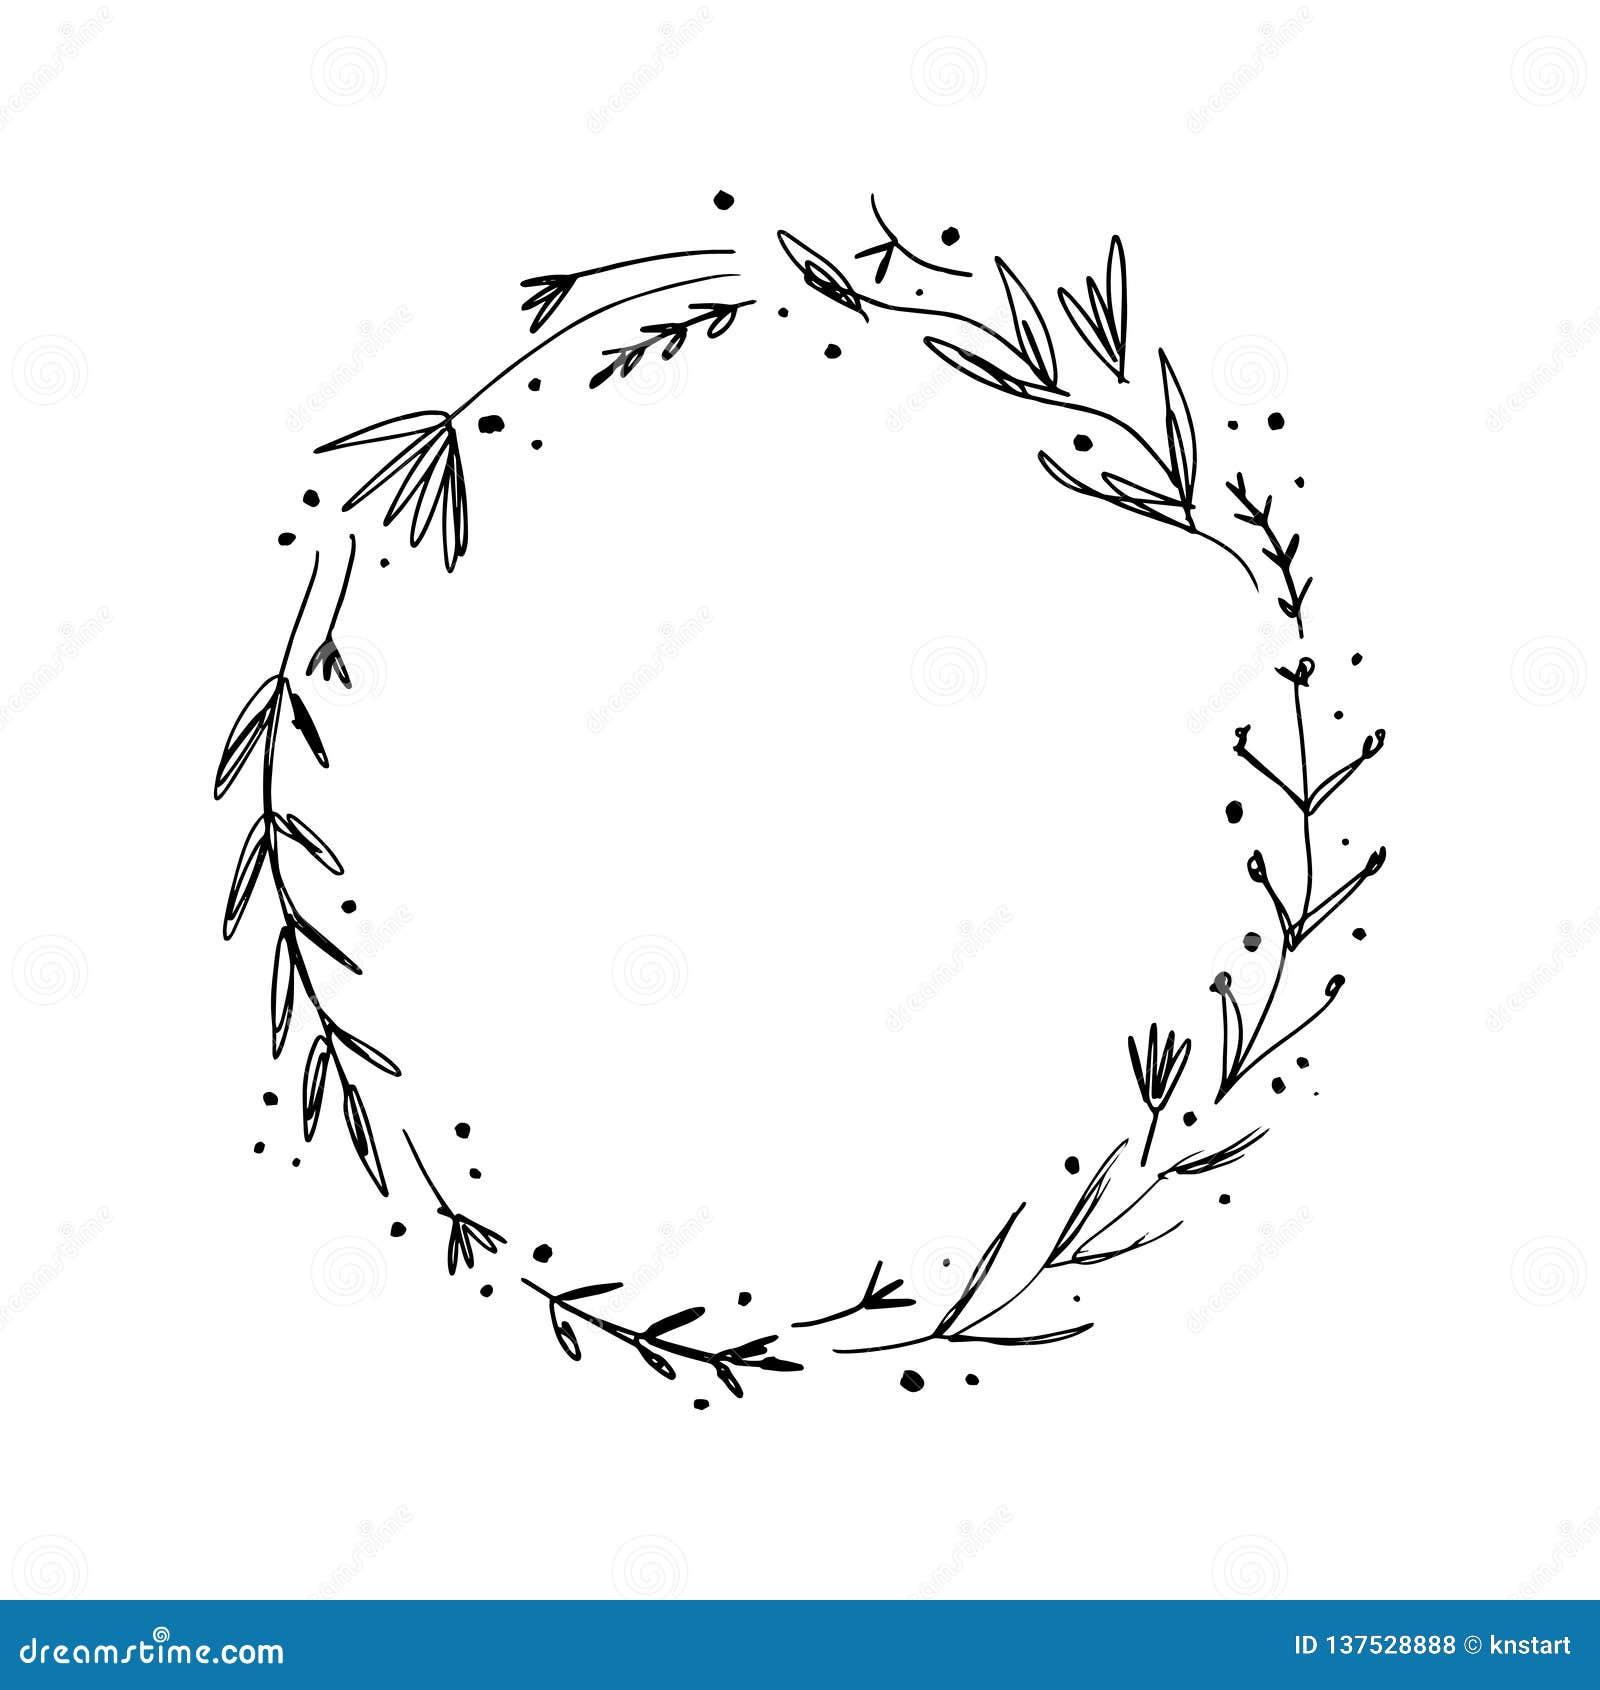 Vector Image Clipart Editable Details Floral Ink Frame Text Template Stock Illustration Illustration Of Boho Branding 137528888